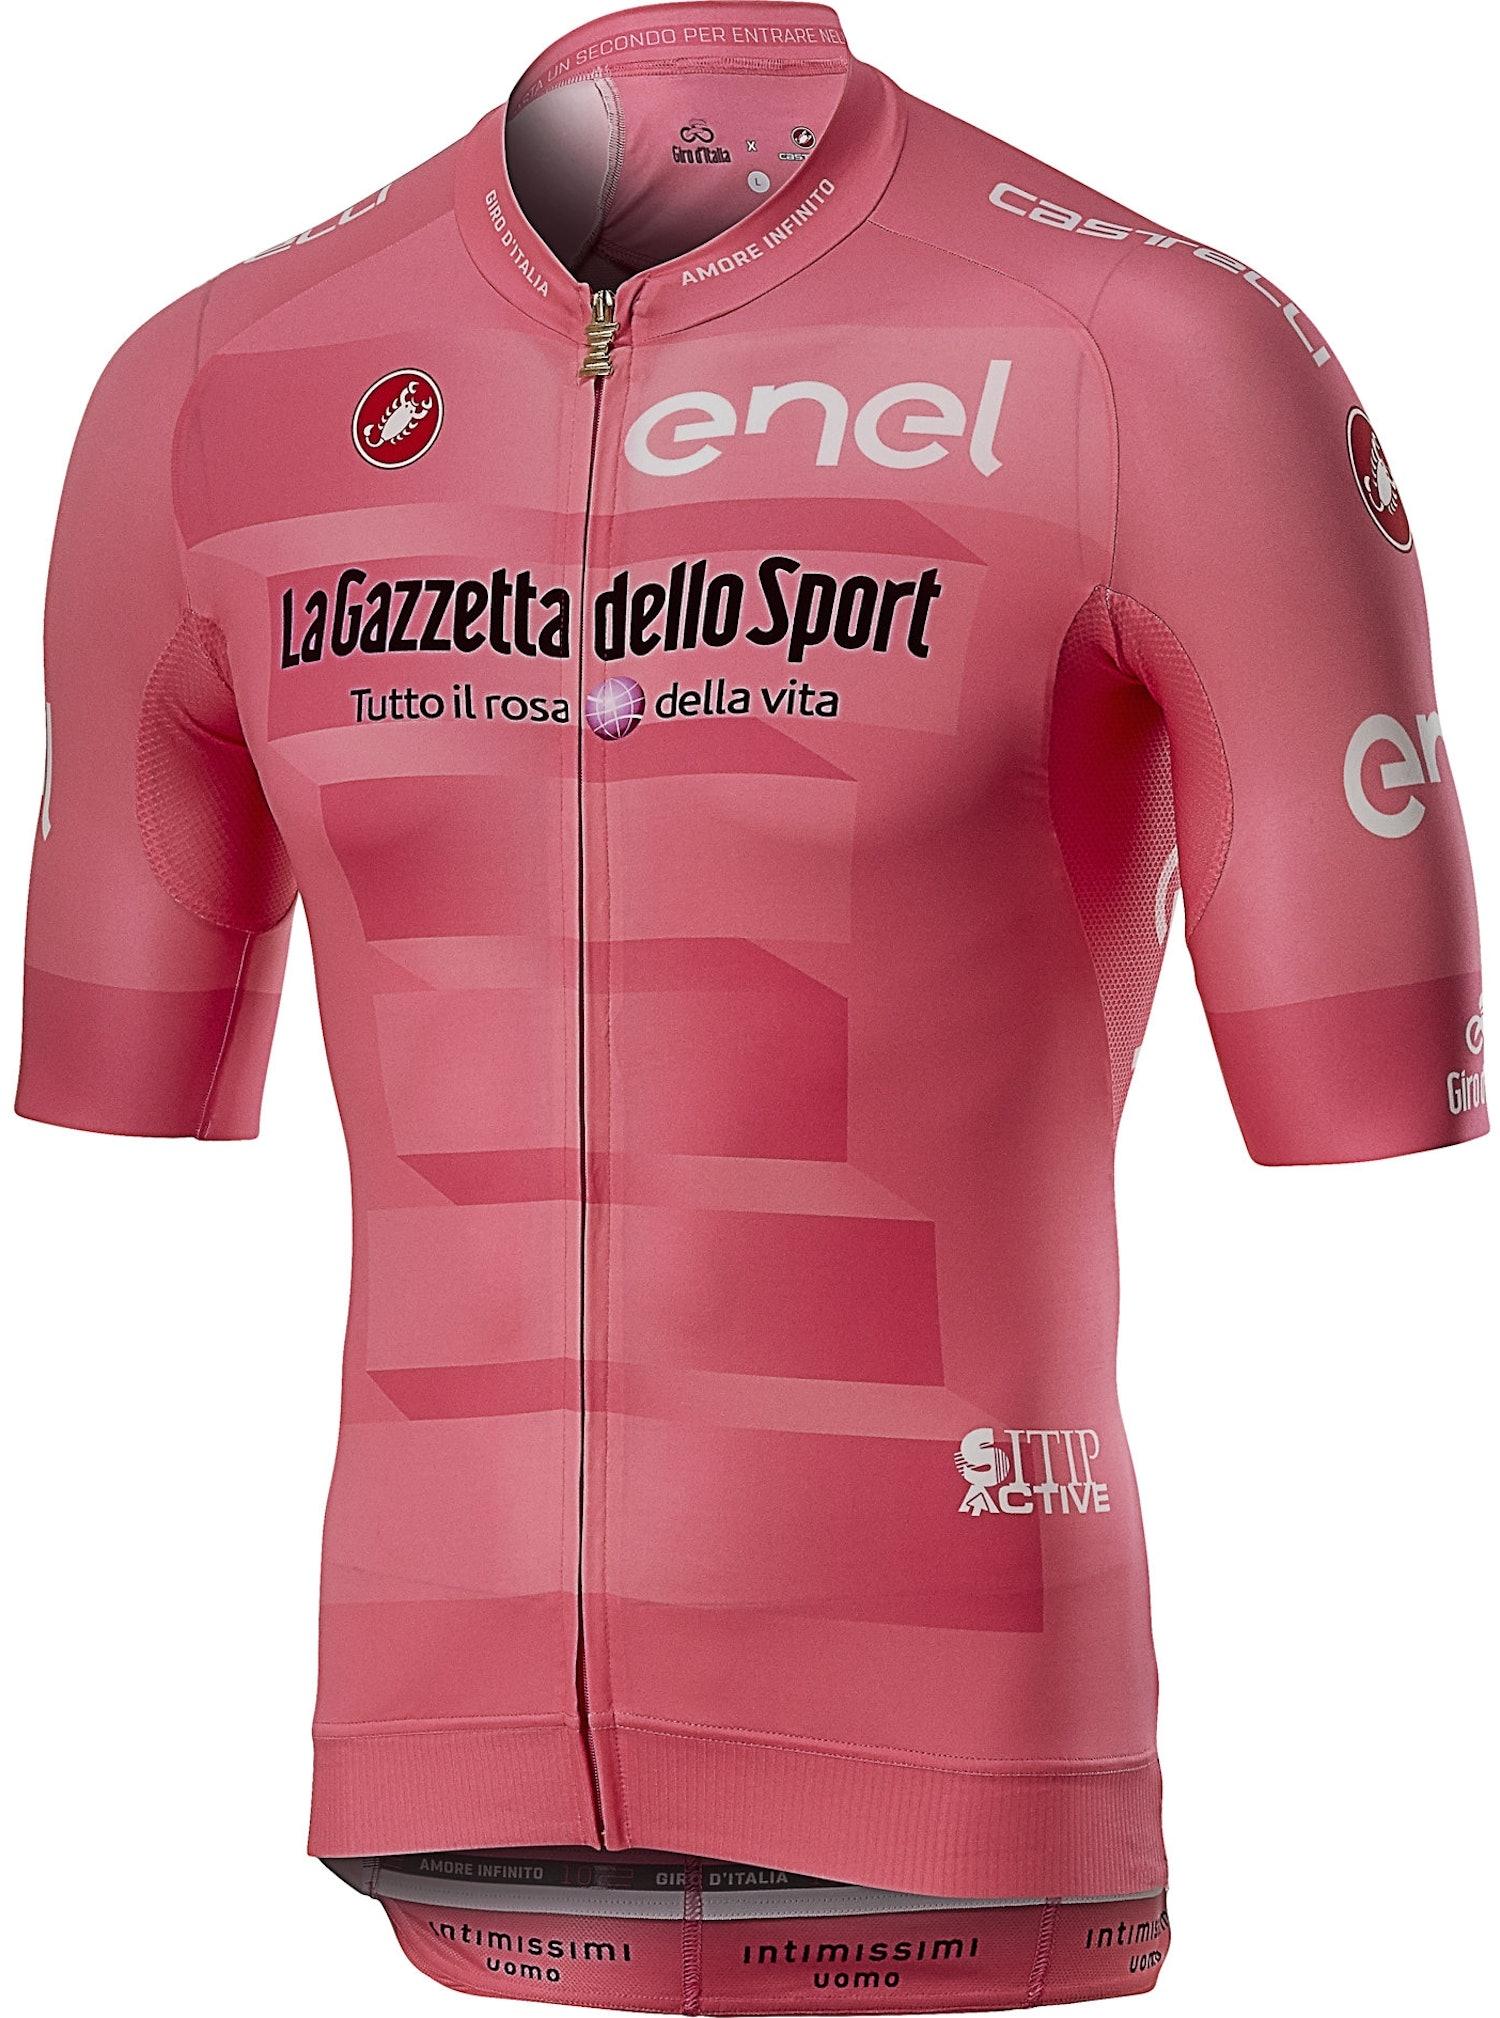 Castelli #Giro102 Race - Maglia Rosa Giro d'Italia 2019 - uomo